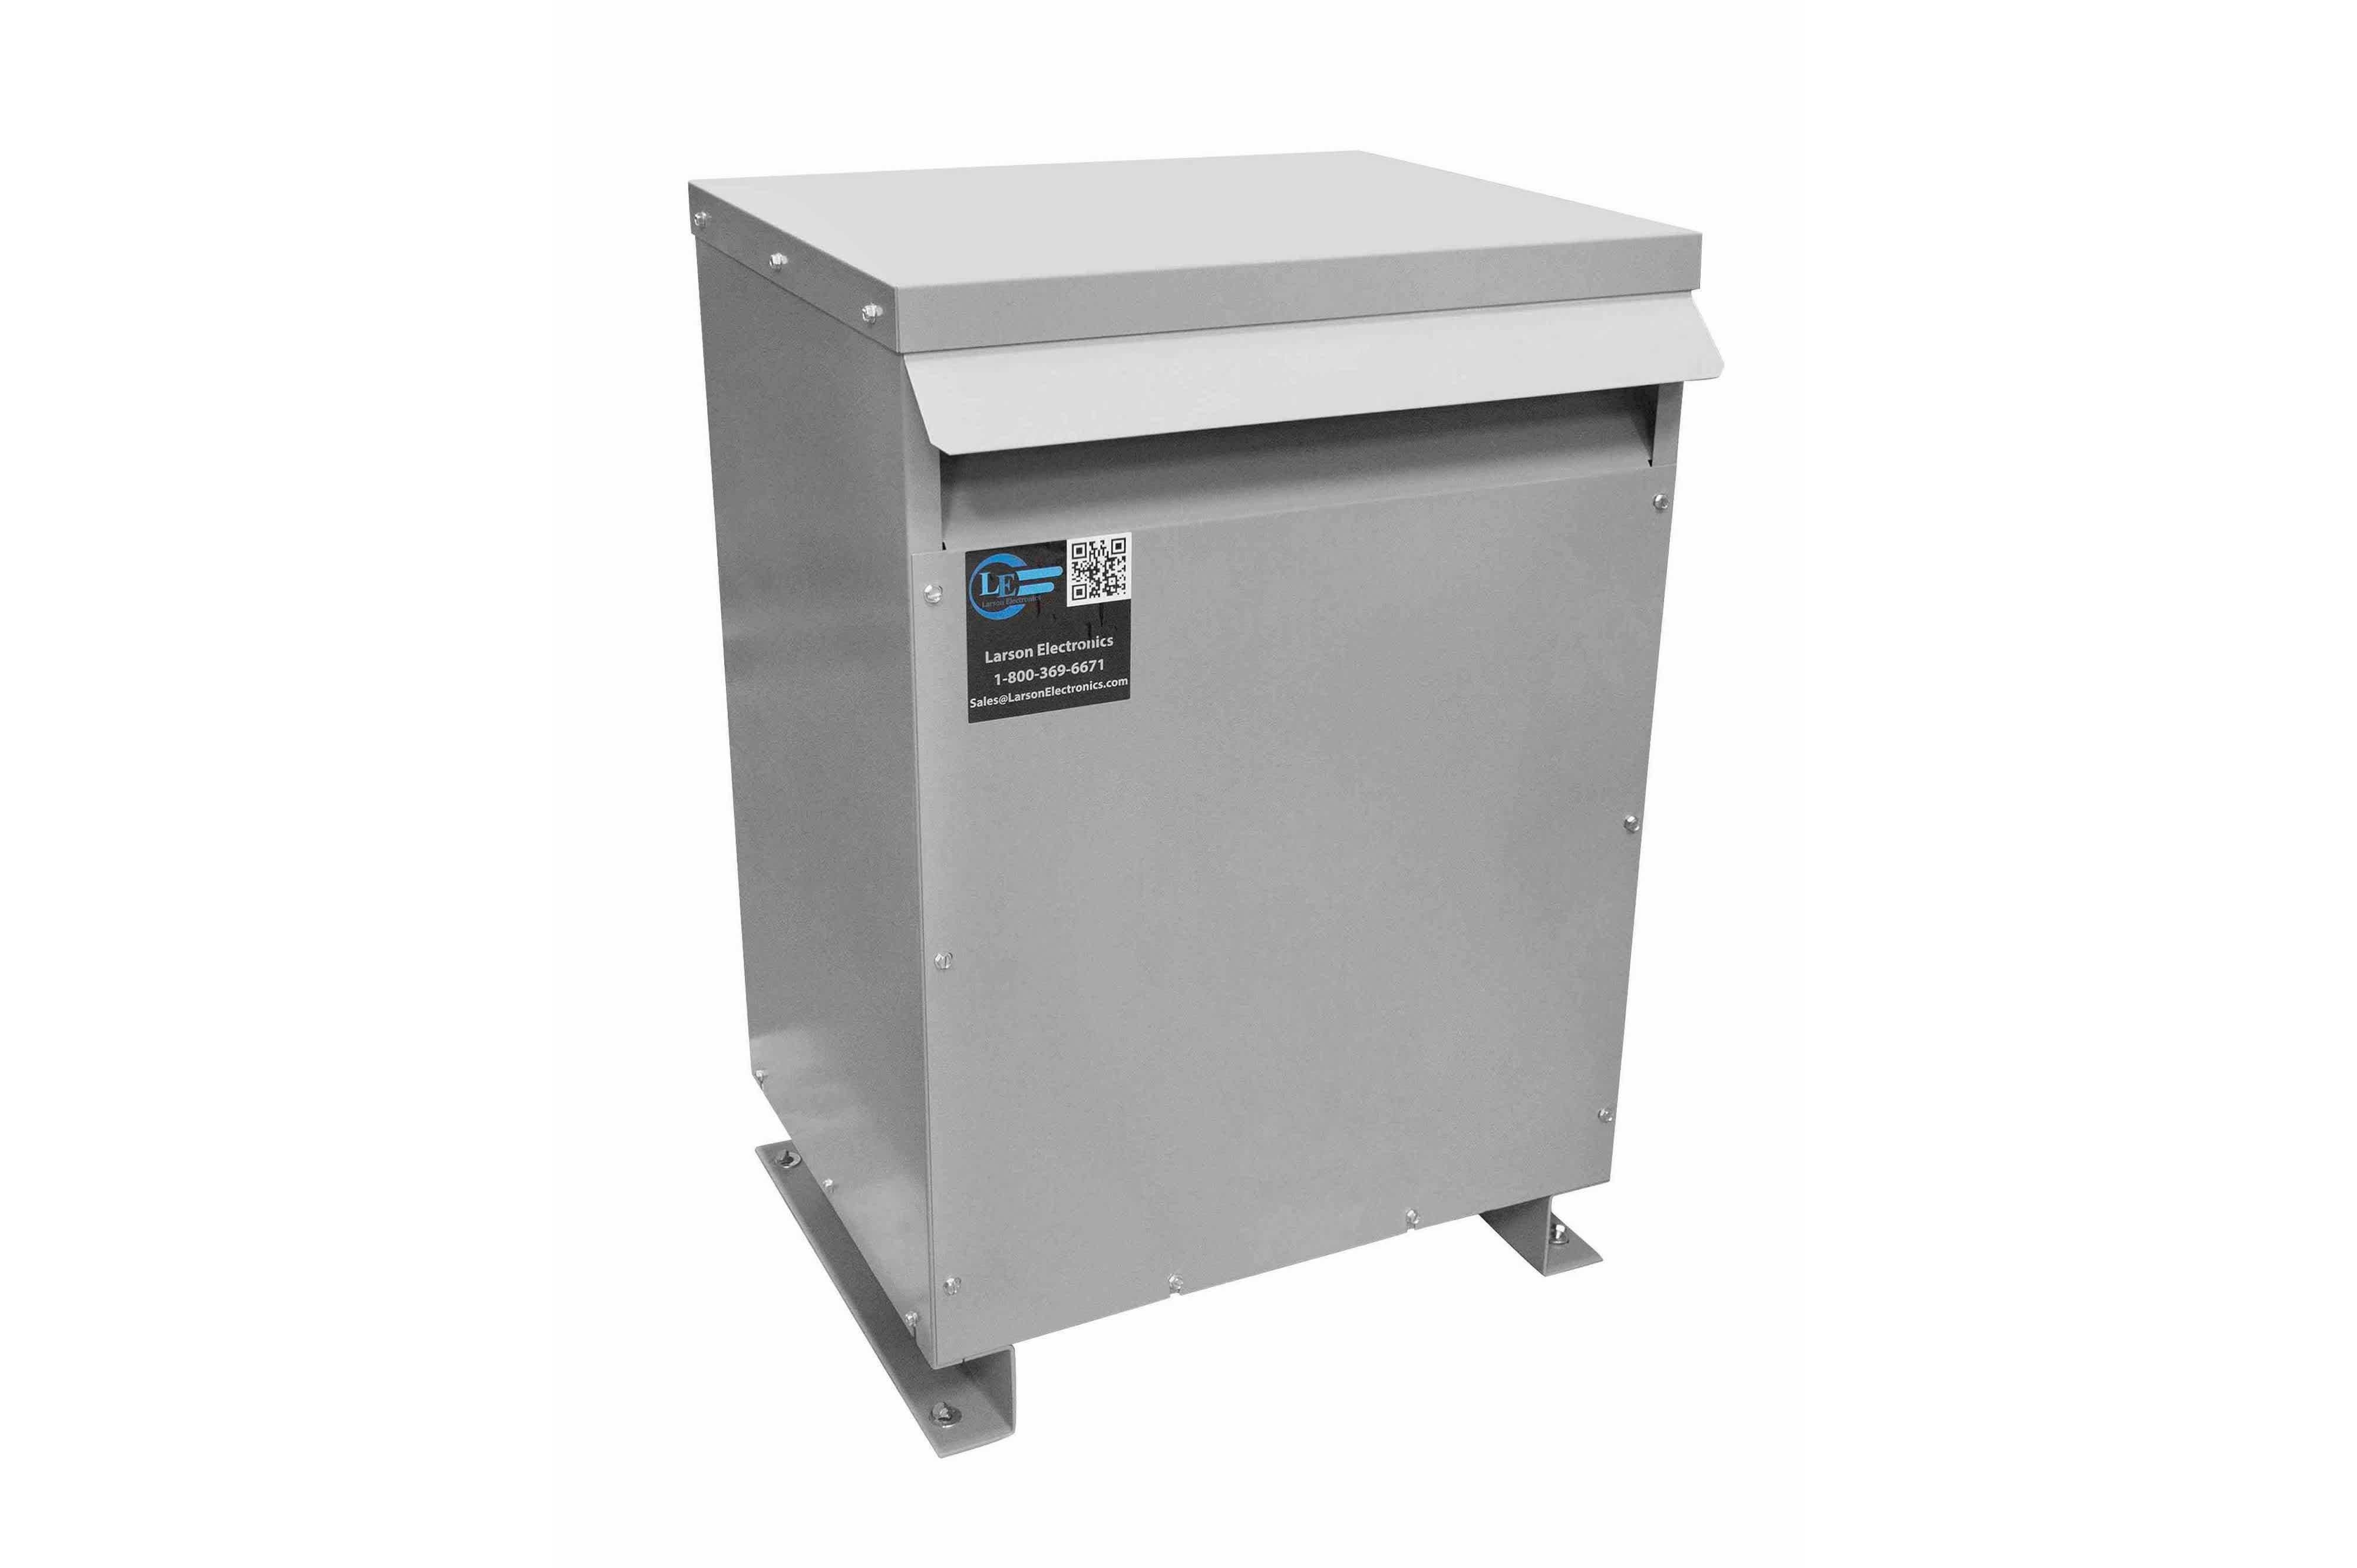 13 kVA 3PH Isolation Transformer, 208V Wye Primary, 240V/120 Delta Secondary, N3R, Ventilated, 60 Hz